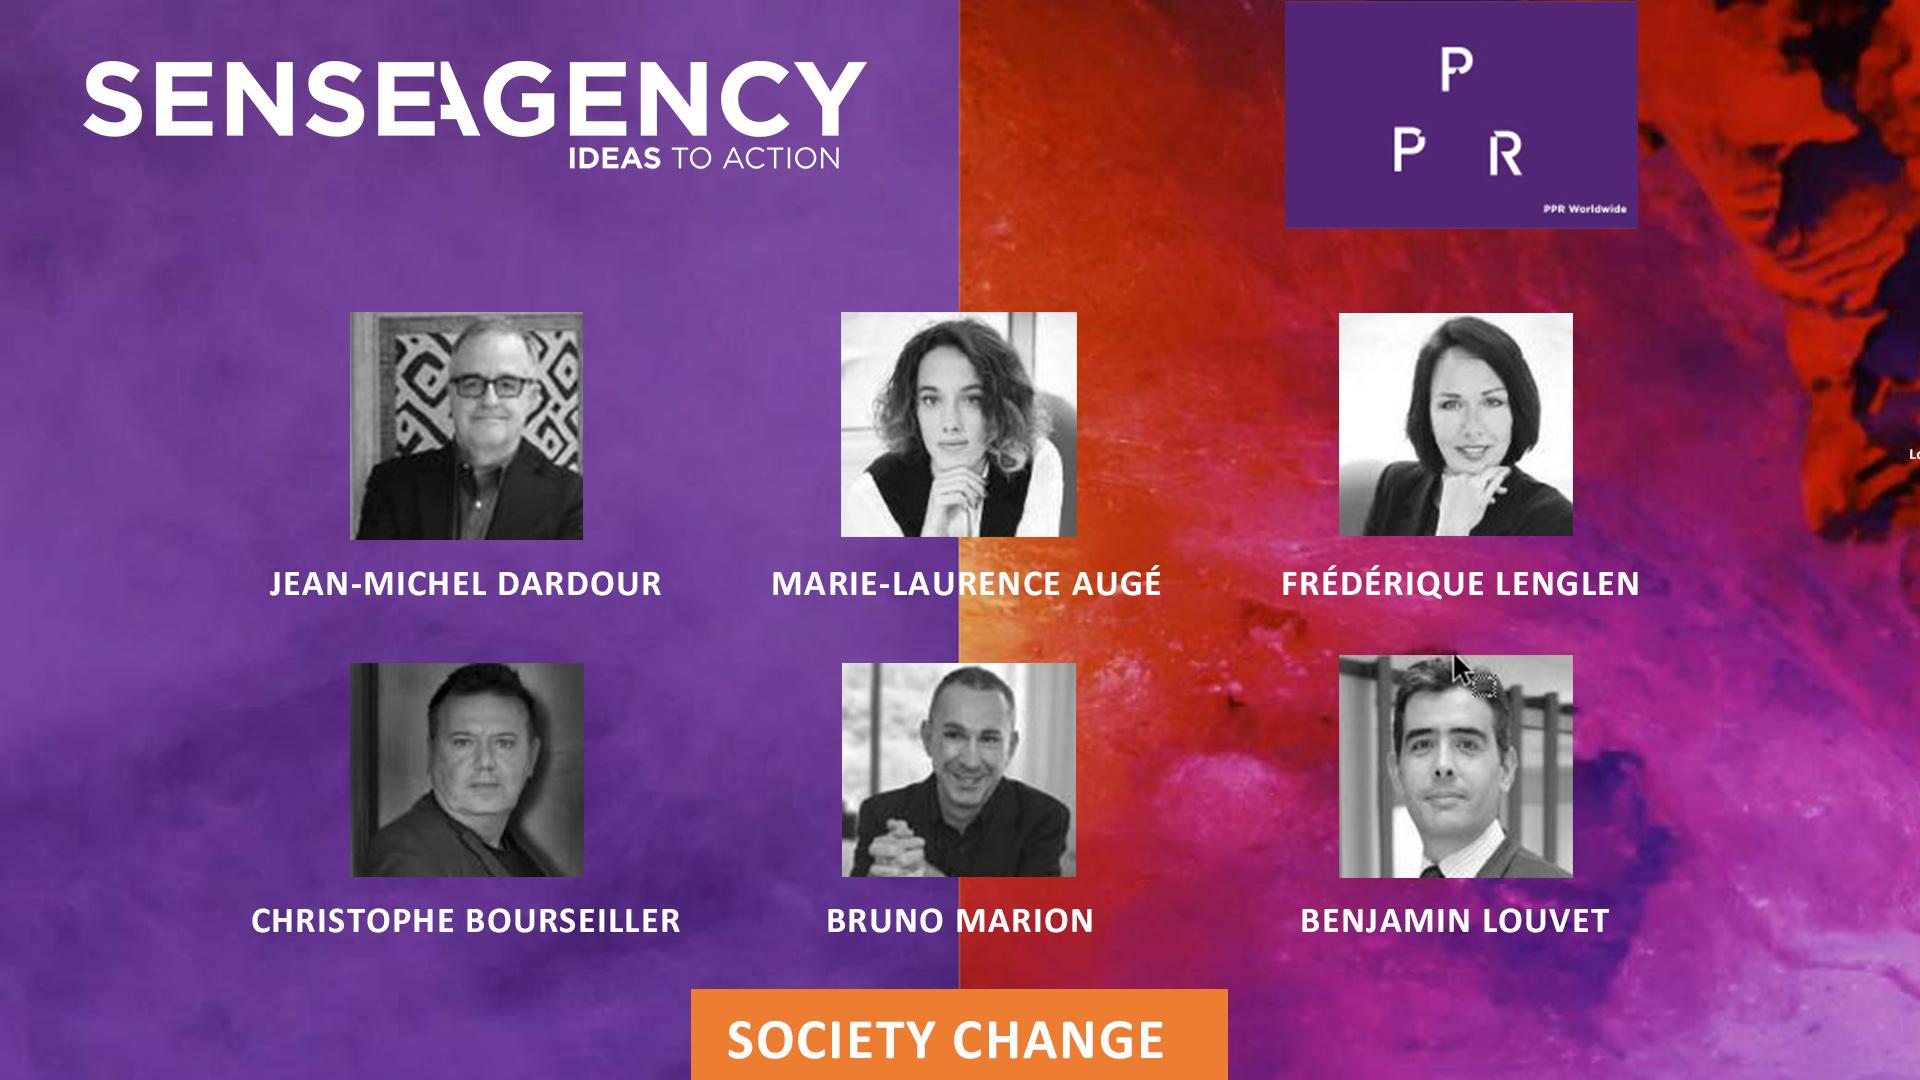 ppr-senseagency - societychange